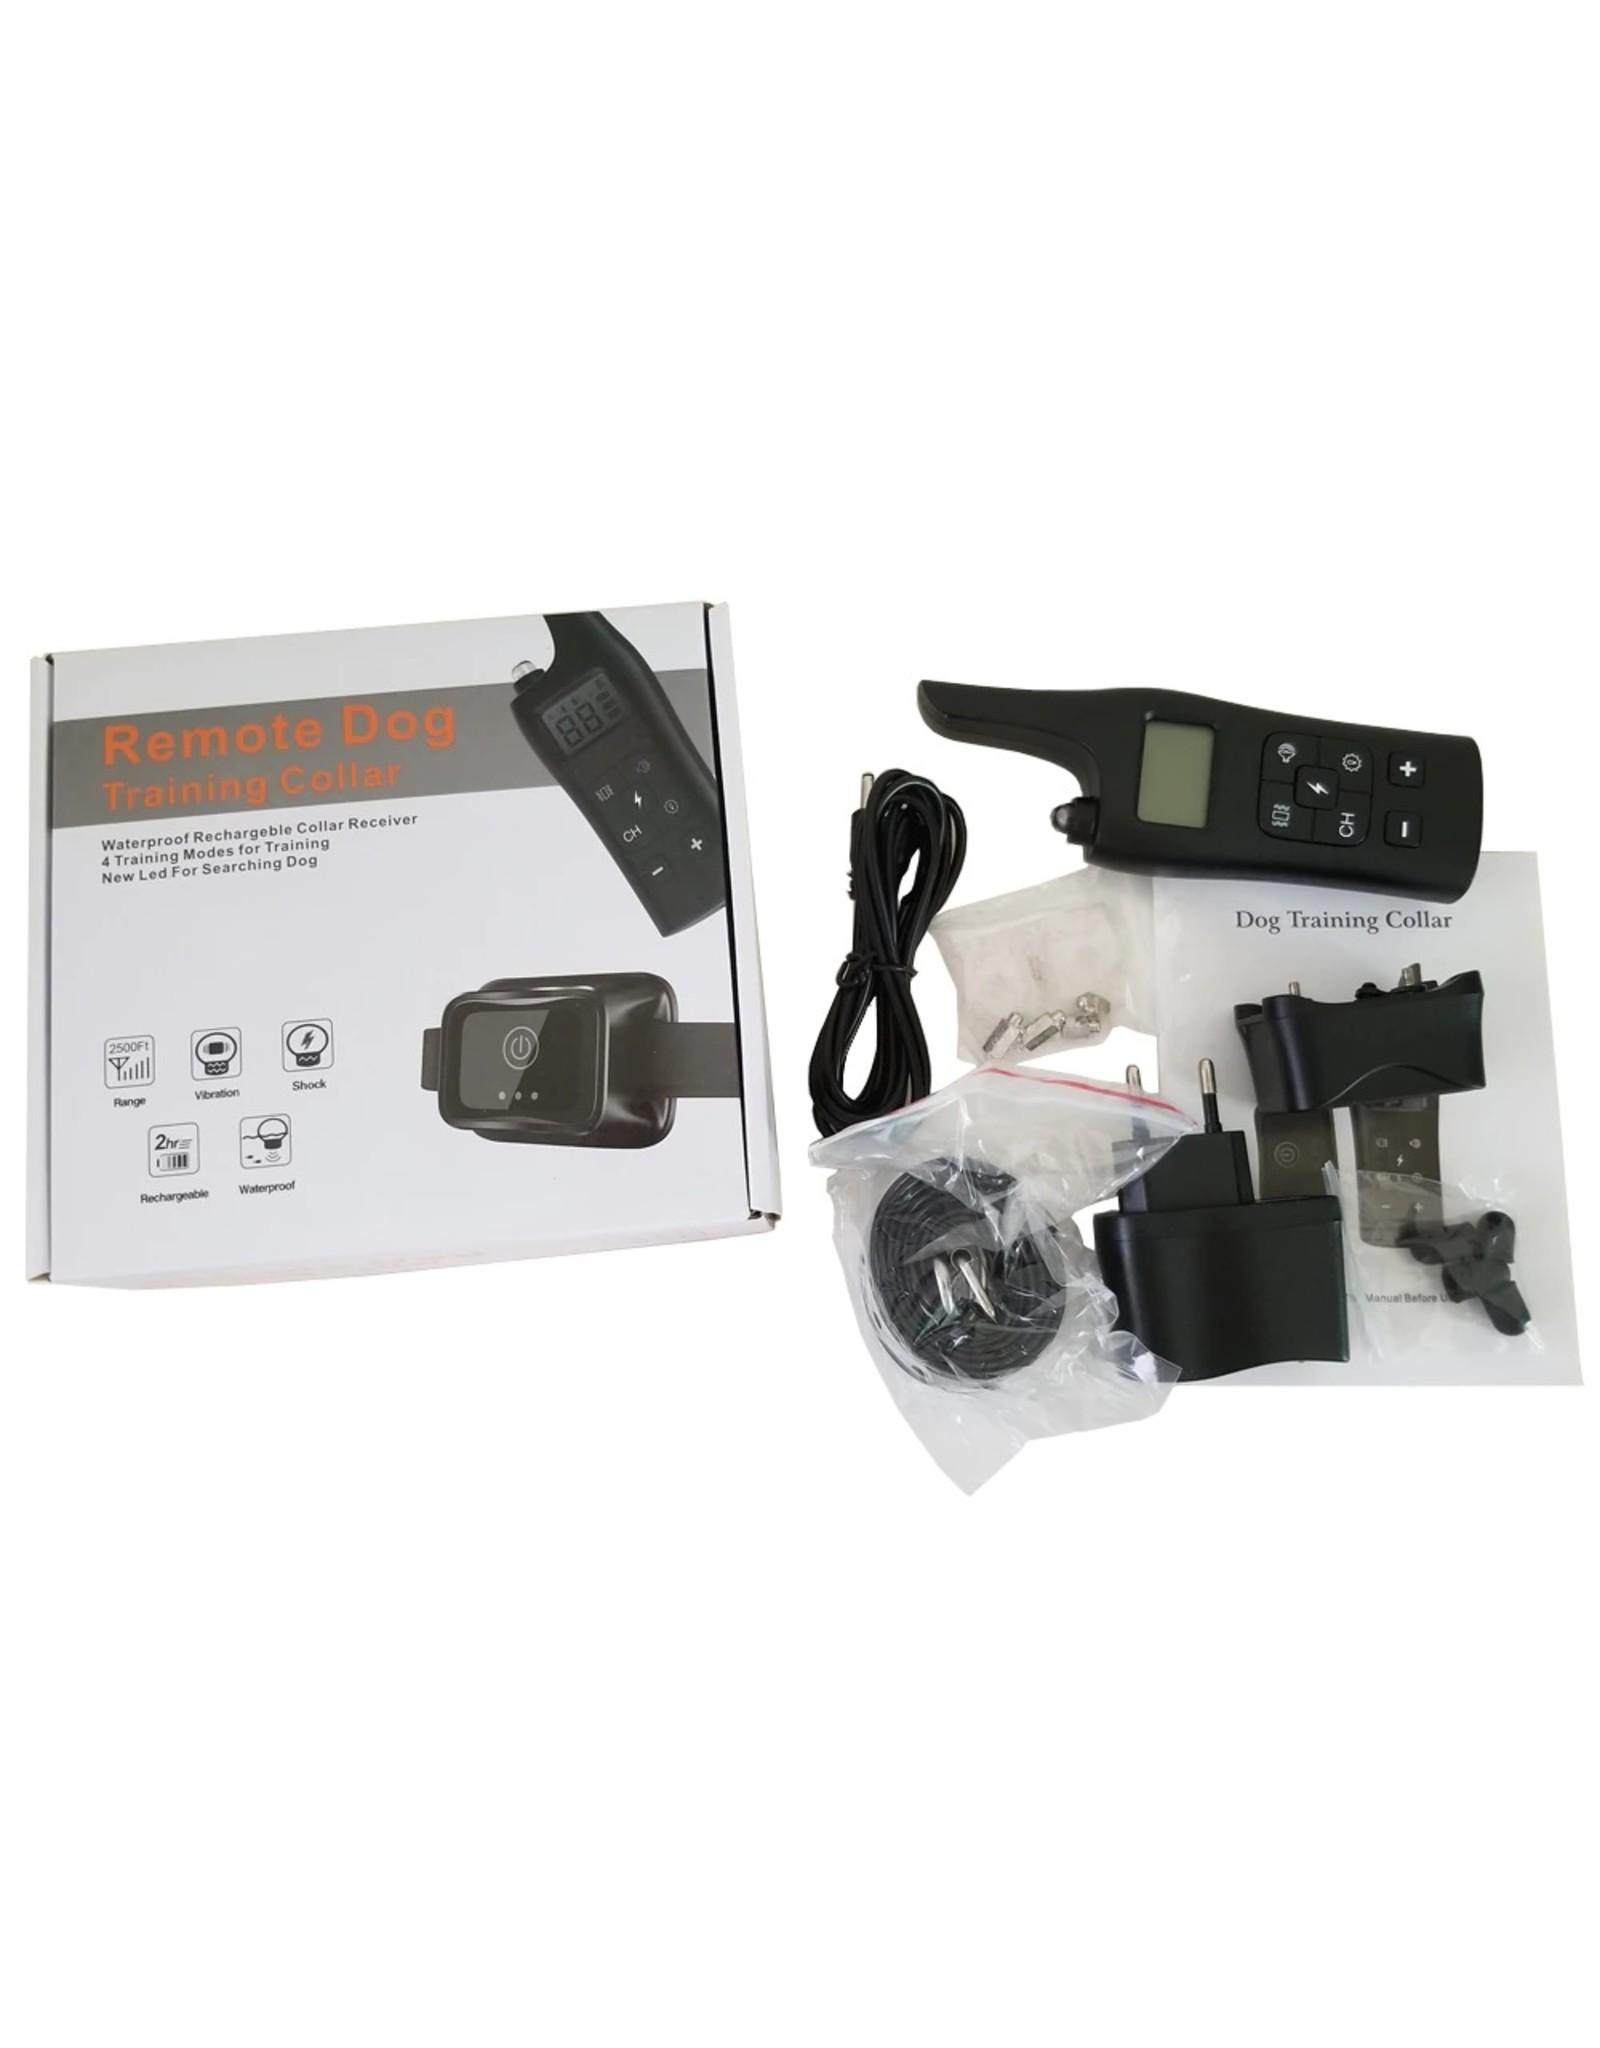 Oplaadbare hondentrainingshalsband - IP67 waterdichte stop-blafhalsband voor kleine middelgrote grote honden met licht LCD-scherm